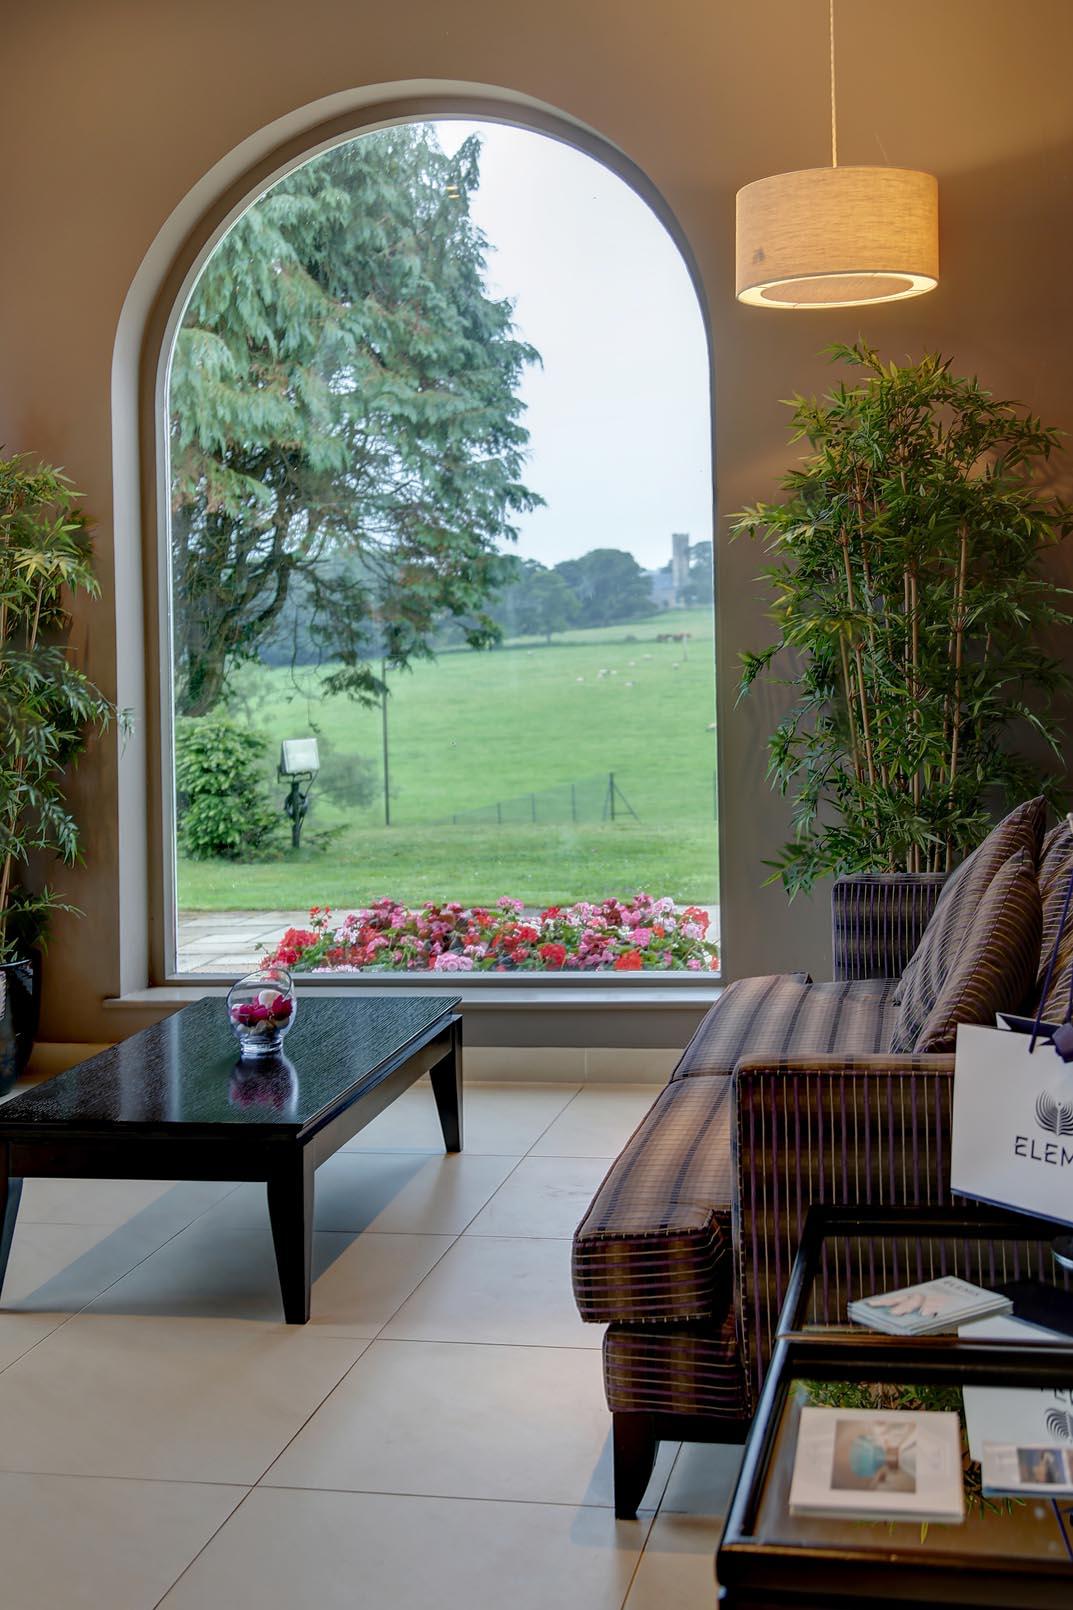 Best Western Hotel Room: Best Western Lamphey Court Hotel & Spa